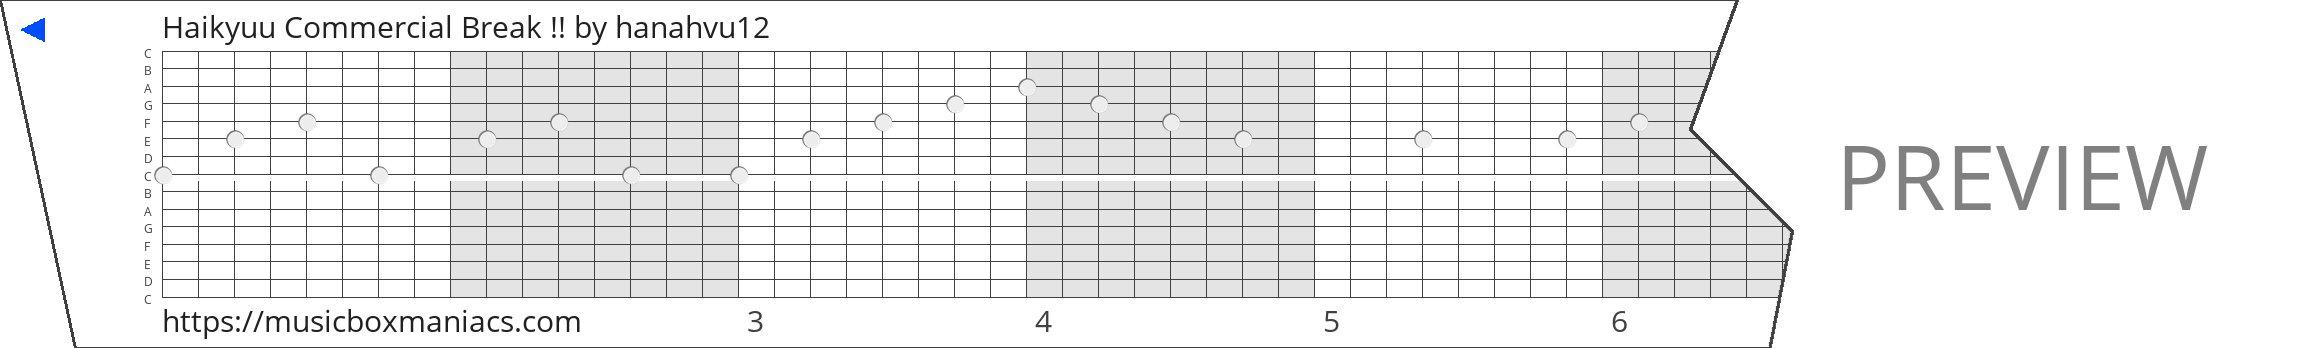 Haikyuu Commercial Break !! 15 note music box paper strip